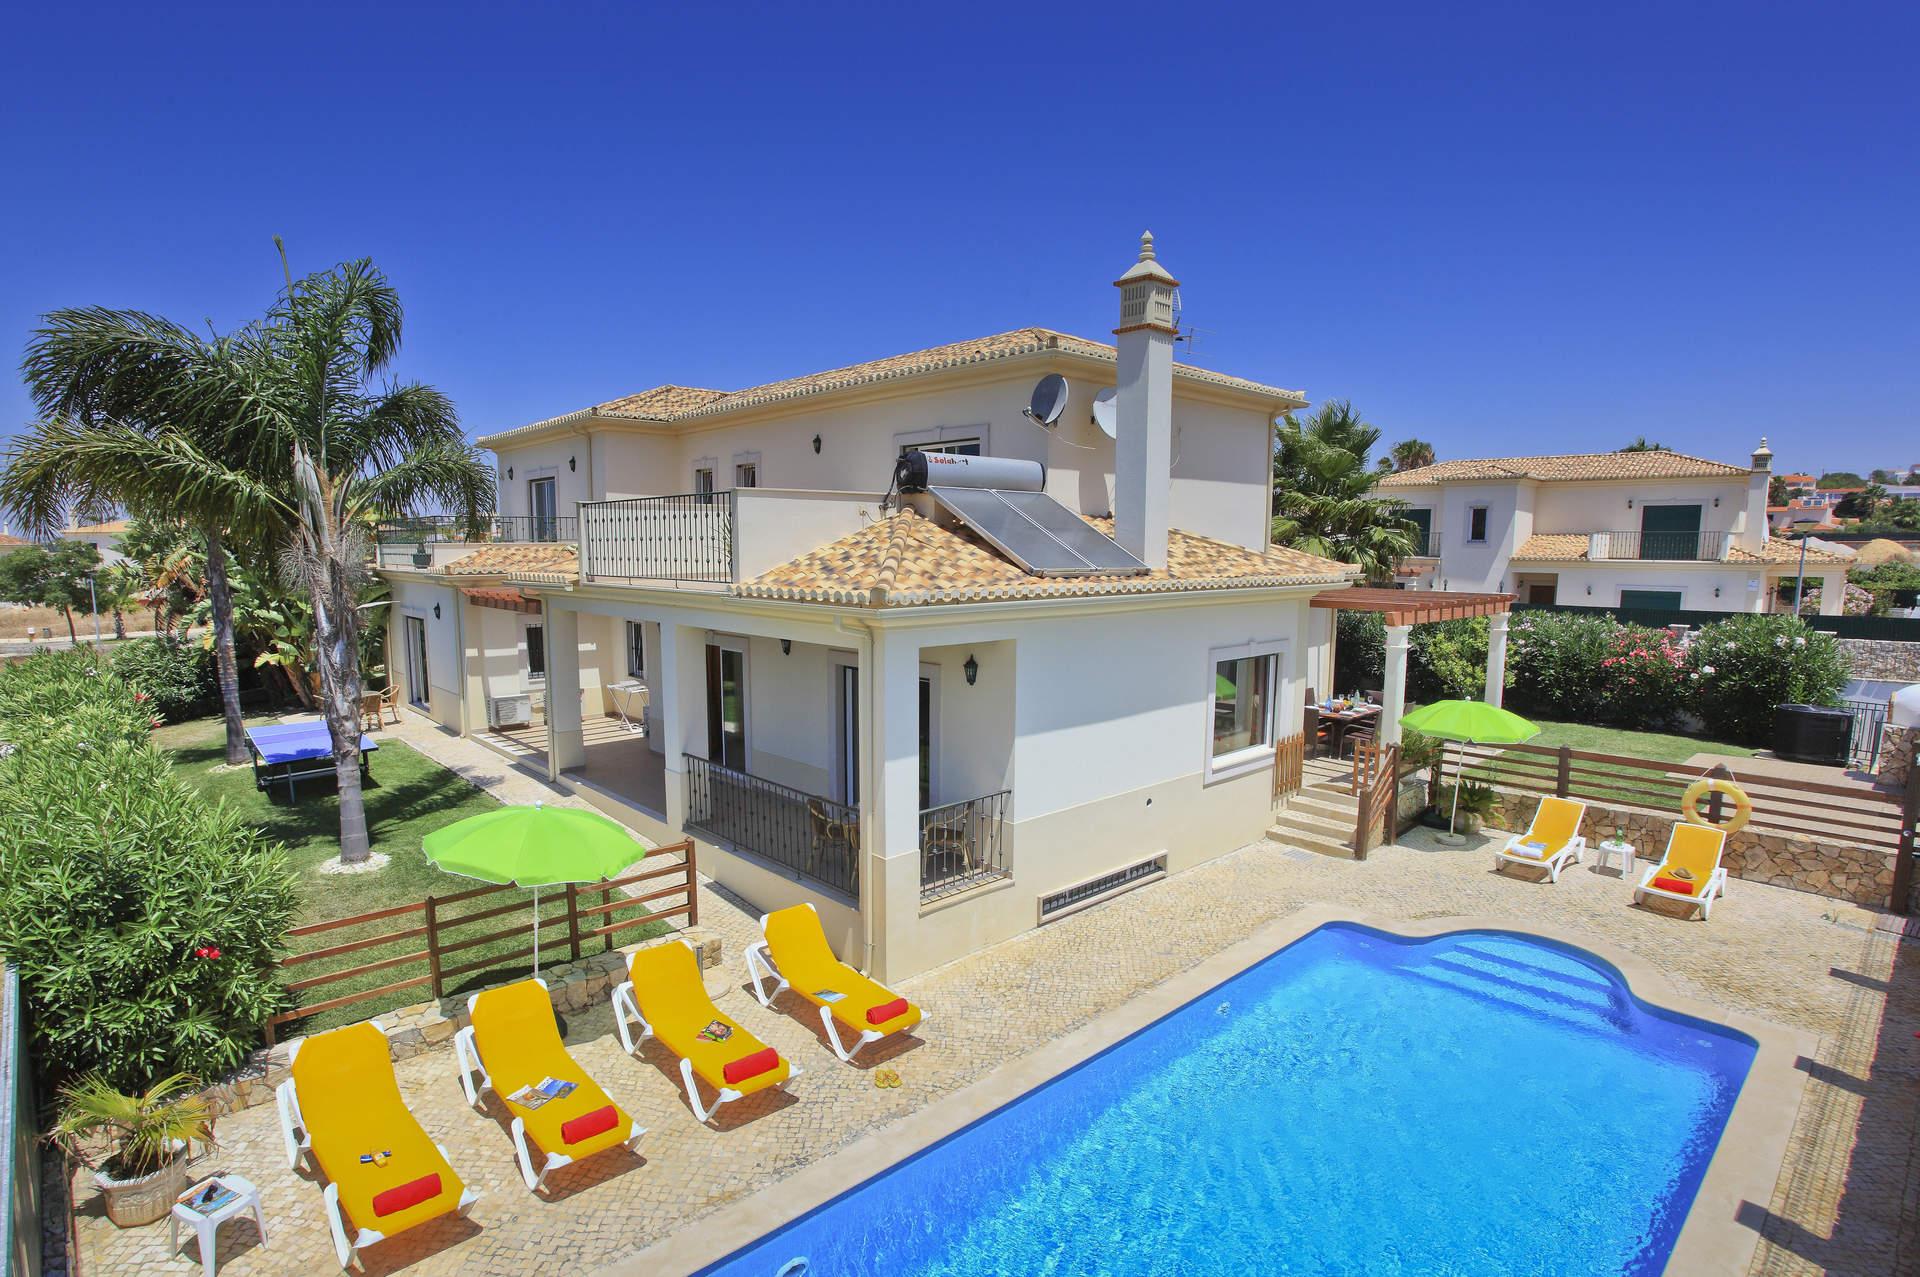 Villa Cordeiro, Gale, Algarve, Portugal